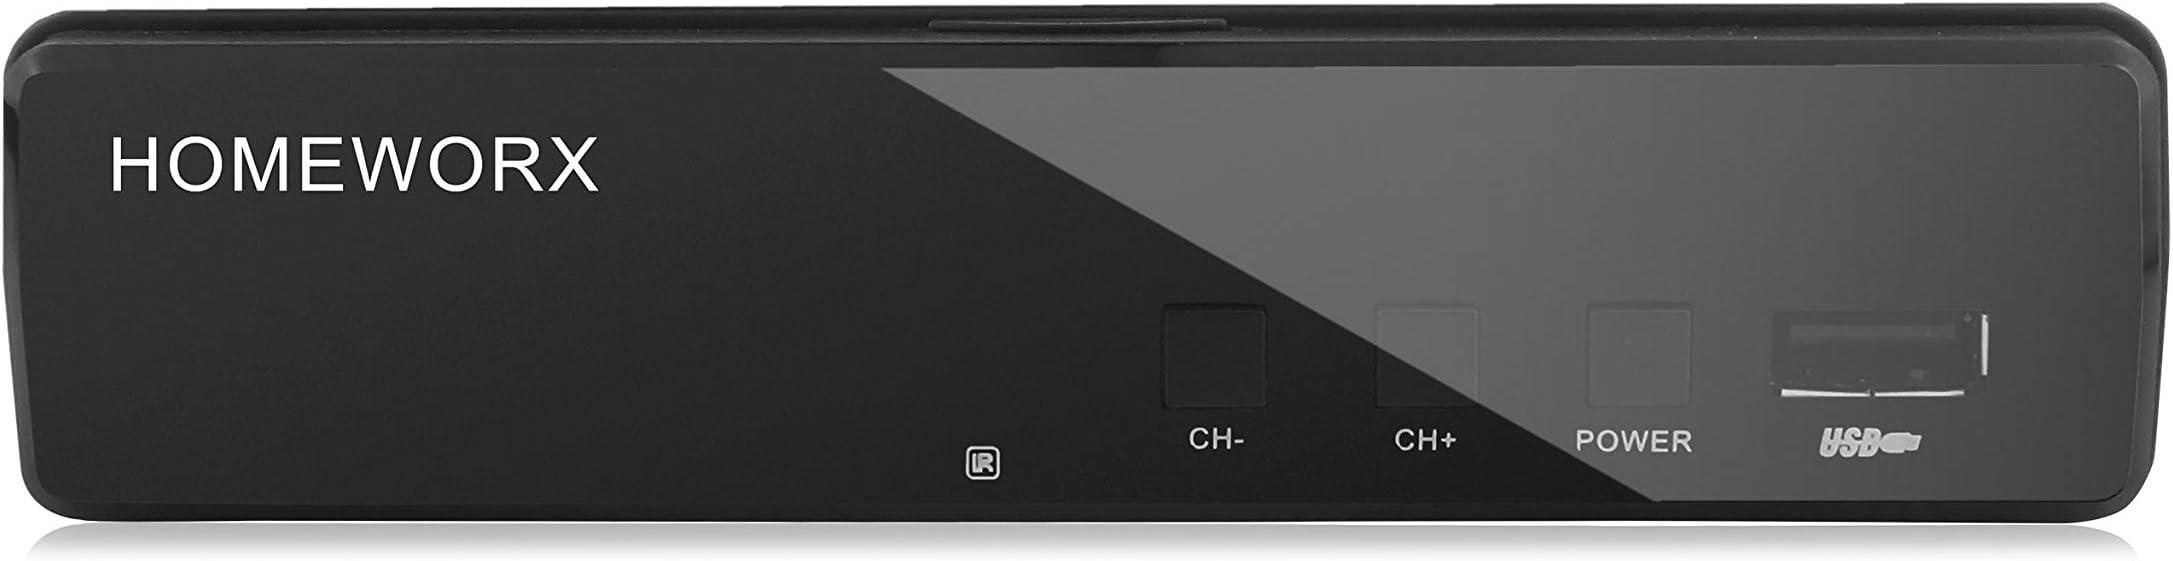 Mediasonic ATSC Digital Converter Box with TV Tuner Function (HW130RN)